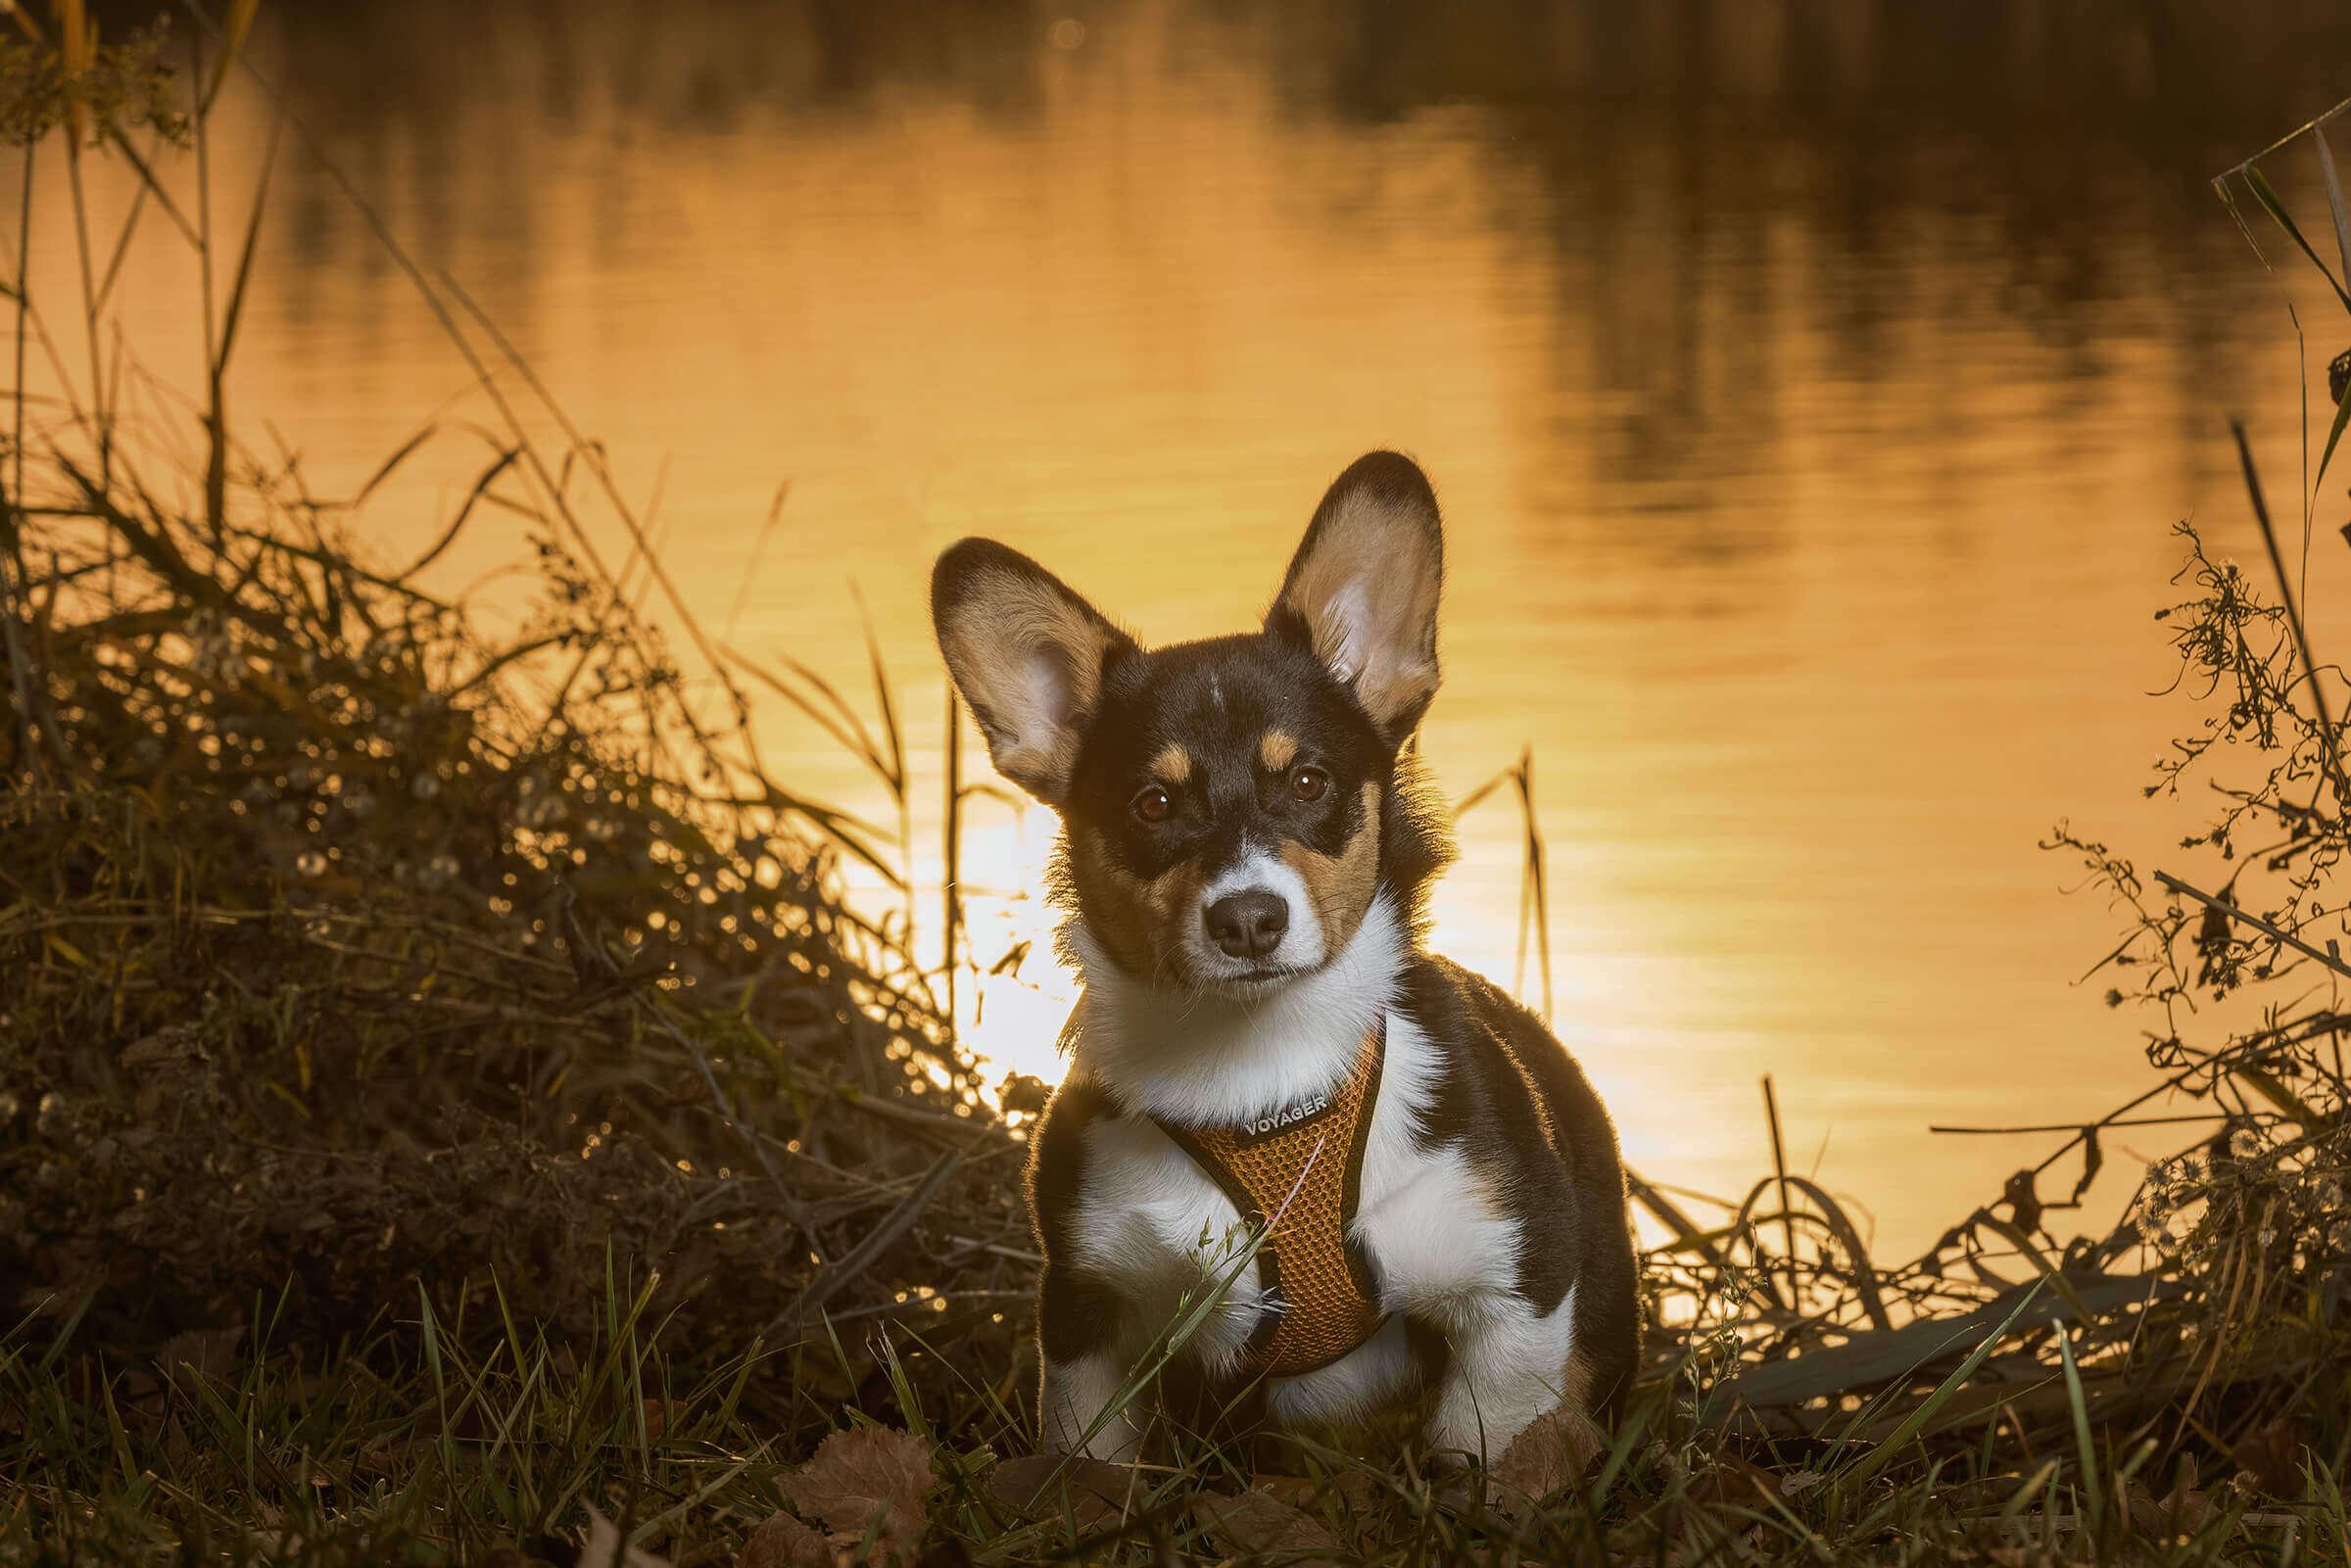 corgi dog poses at sunset